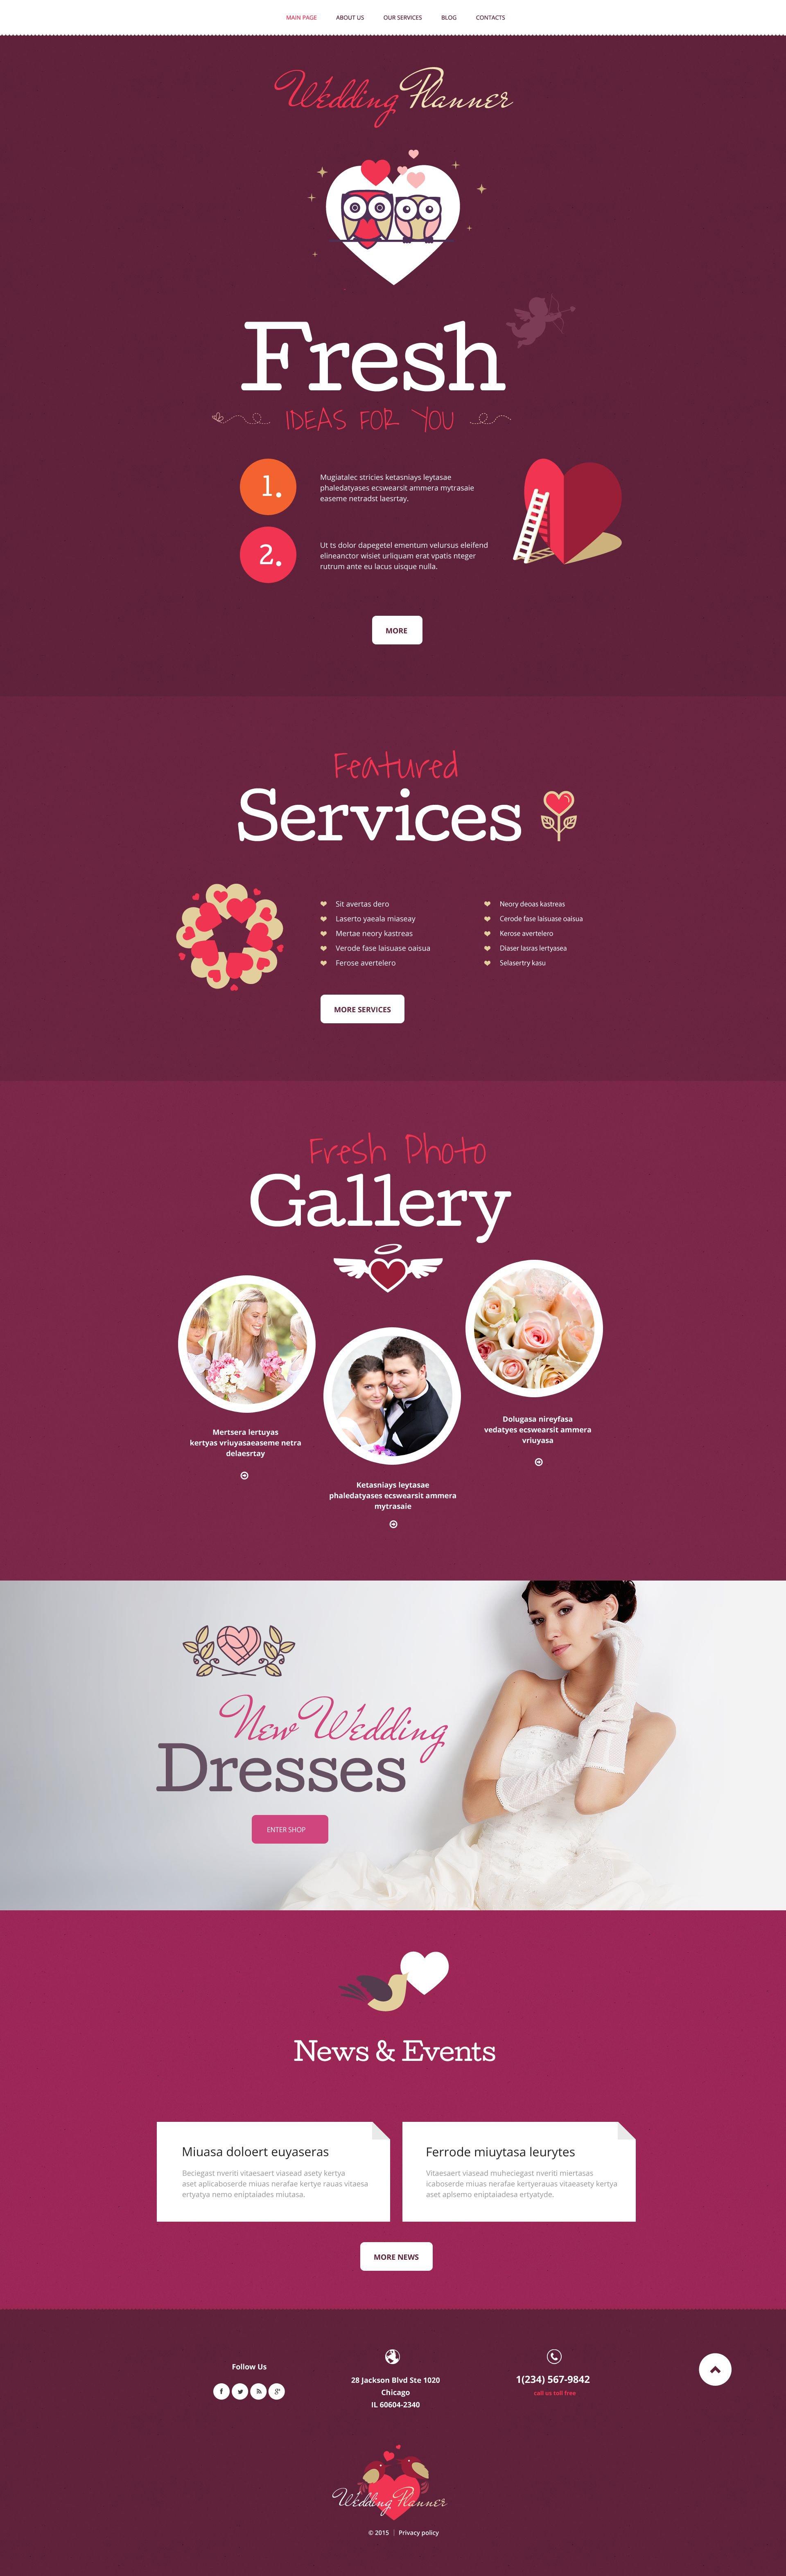 "Modello WordPress Responsive #55043 ""Wedding Planner"""